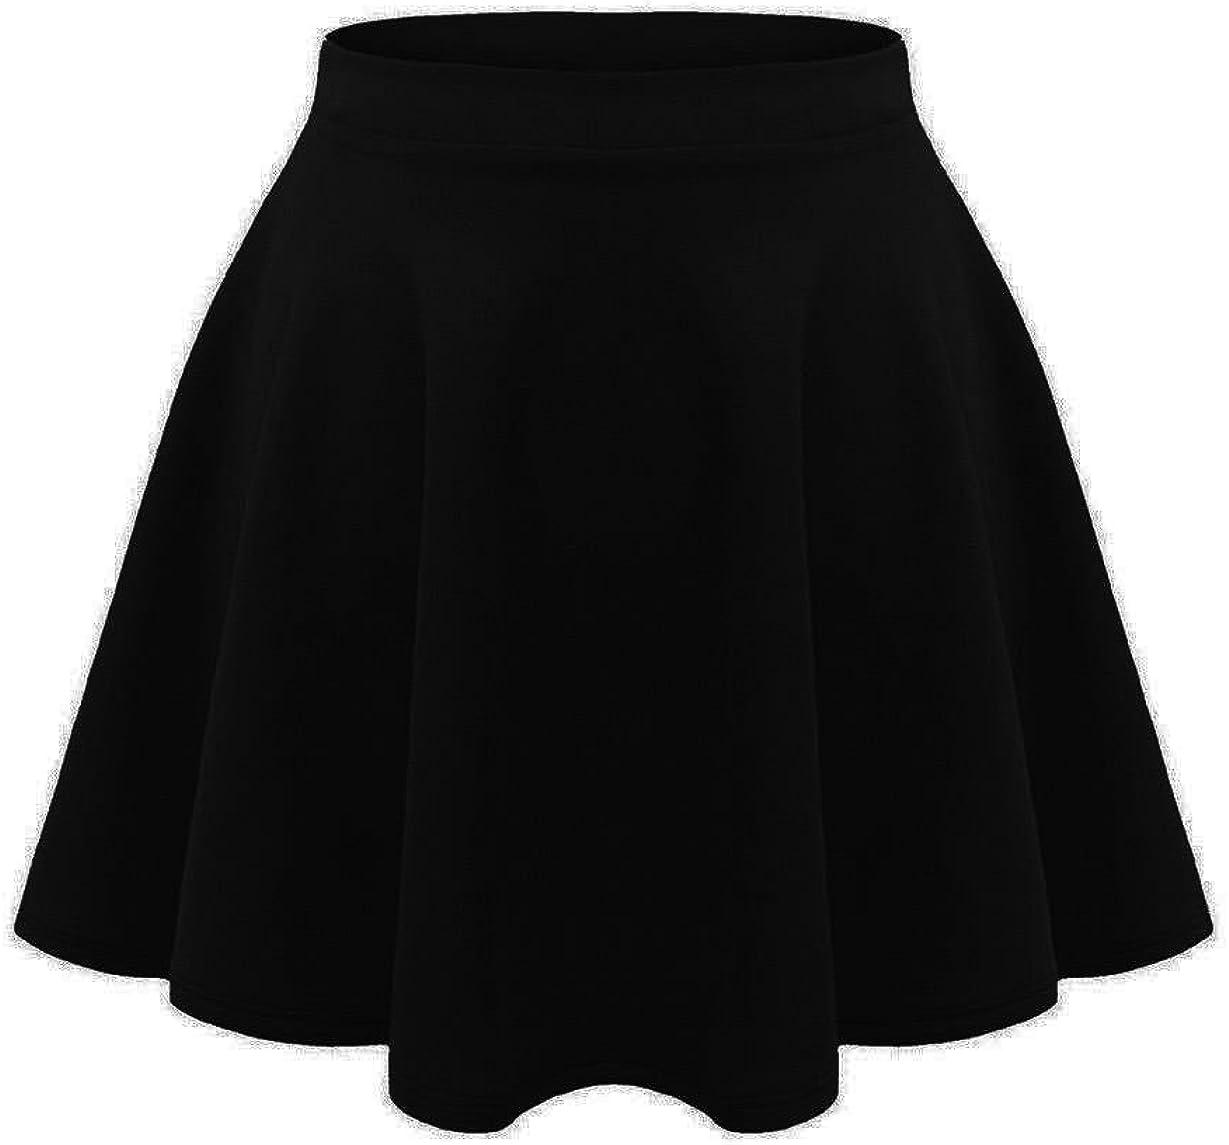 janisramone Kids Girls Children New Plain Flippy Flared High Waistband Stretch Short Mini Skater Skirts